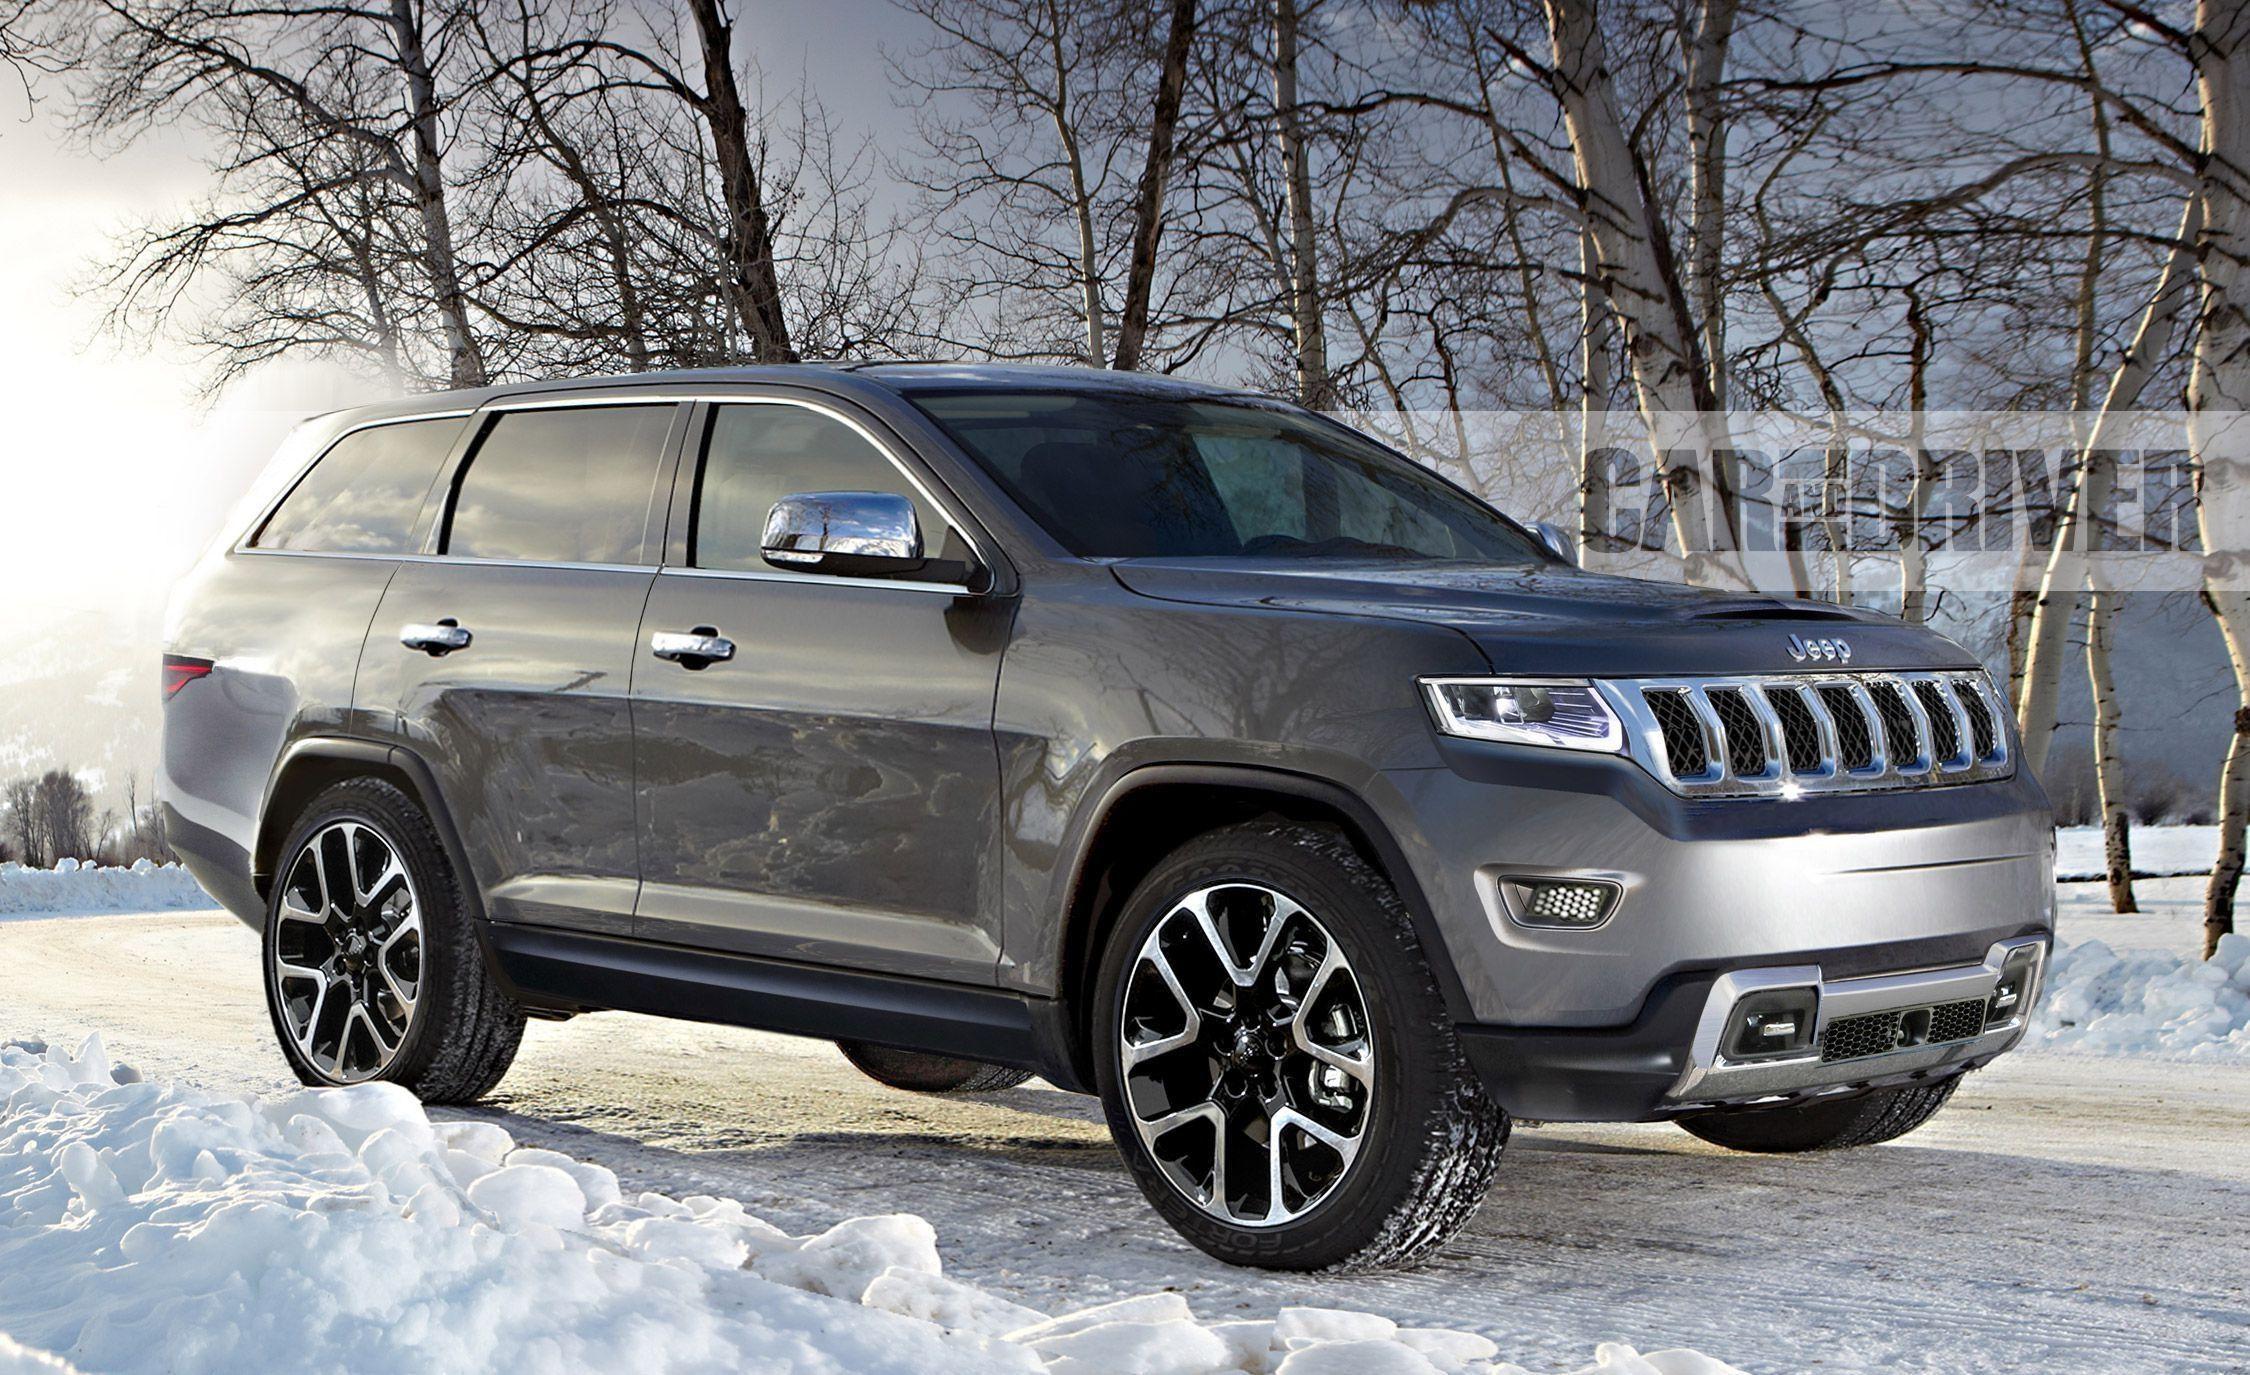 Jeep Wagoneer 2020 Price Redesign In 2020 Jeep Grand Cherokee Jeep Wagoneer Jeep Suv